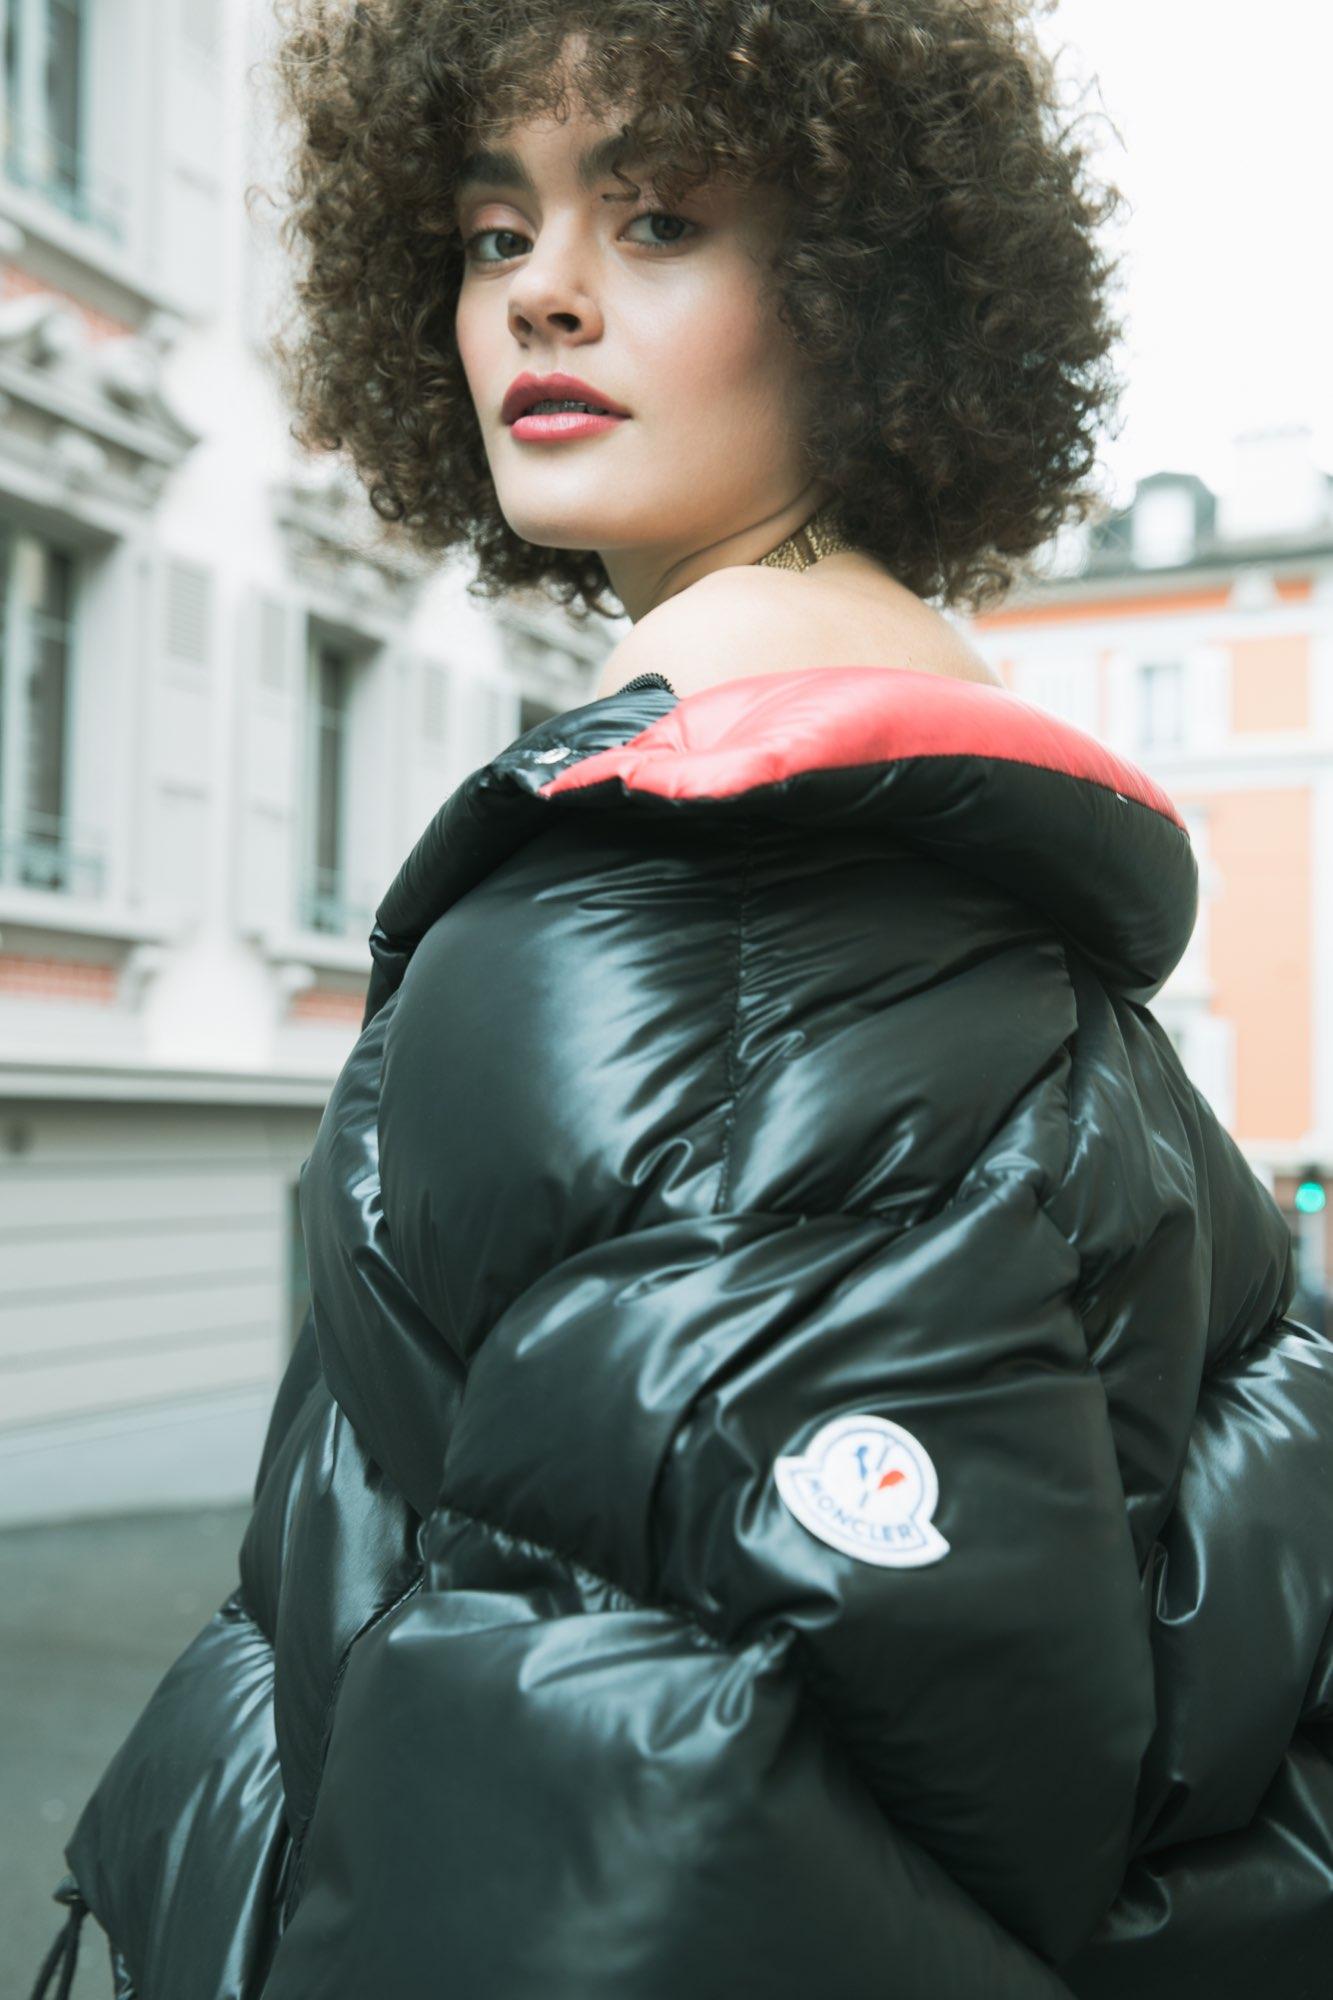 Hair, Nail, Make-up und Fashion styling portfolio / juliette-lamy-rousseau - photographer-usetobelhurt-ID432-1.jpeg?v=1571920582